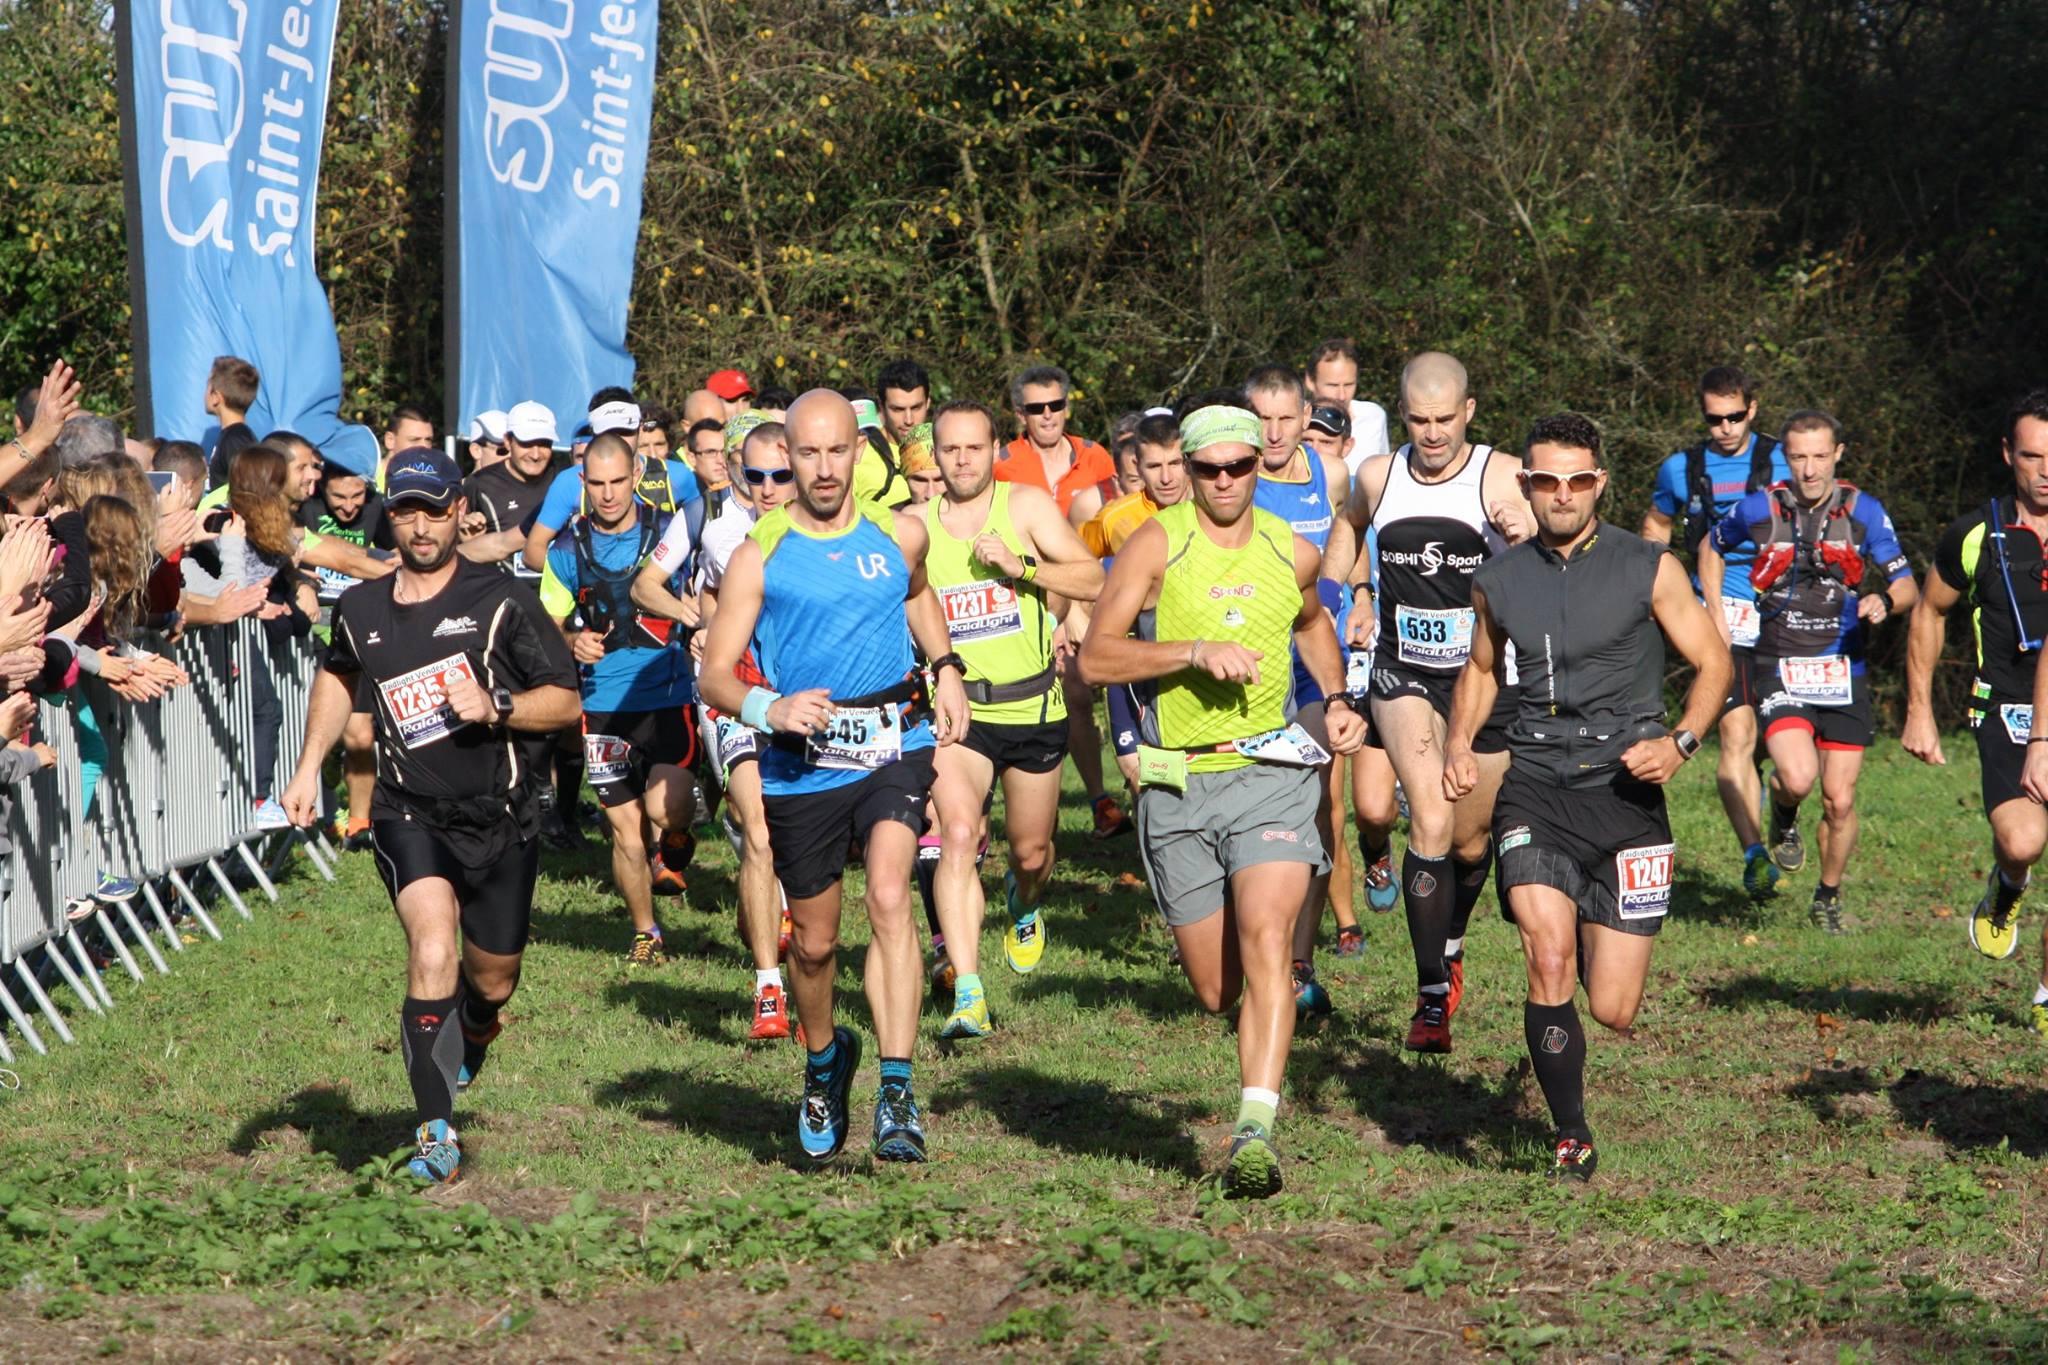 Défi SUPER U : 12 km diurne (15h30) + 12 km nocturne (19h15) à Saint Jean de Monts